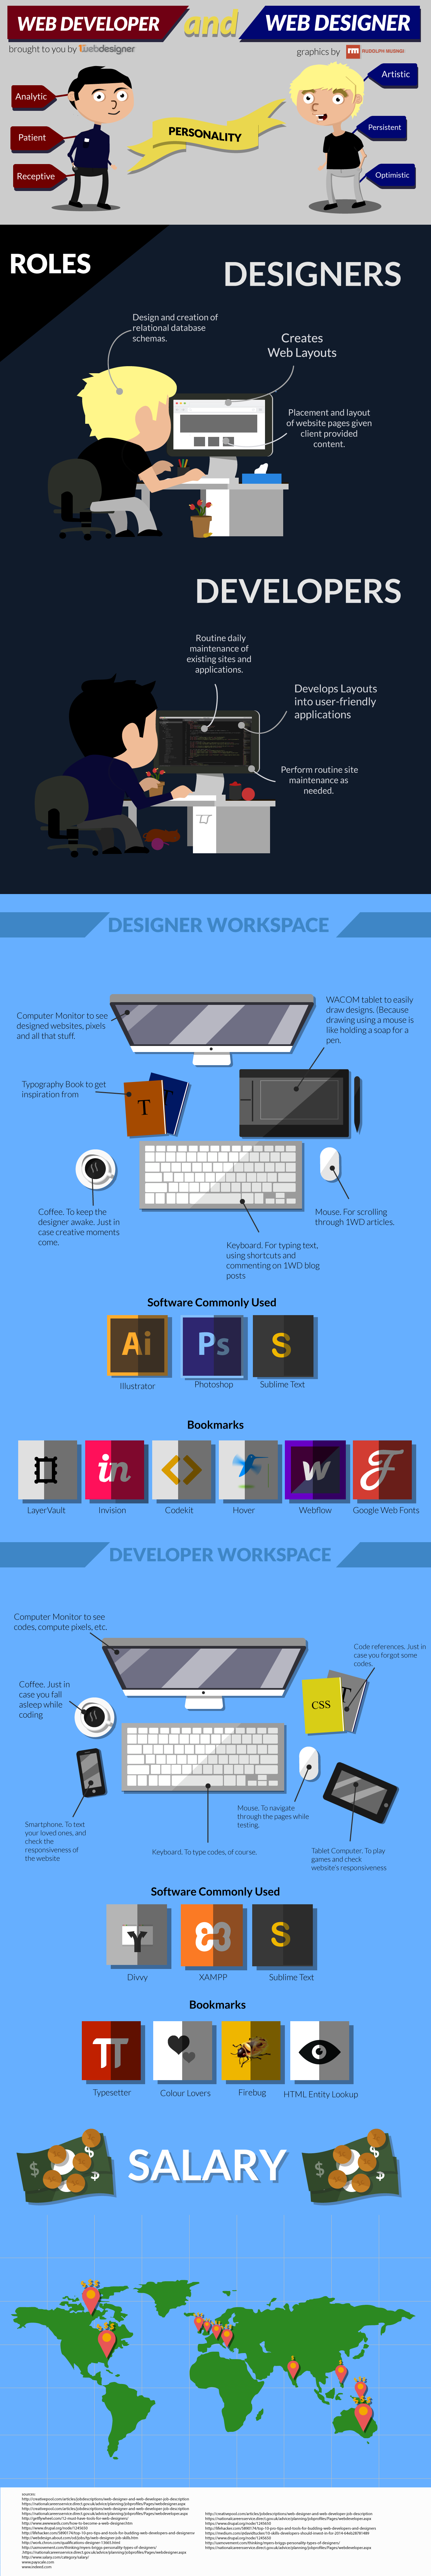 Web Developer Vs Web Designer Web Development Design Web Design Web Design Tips